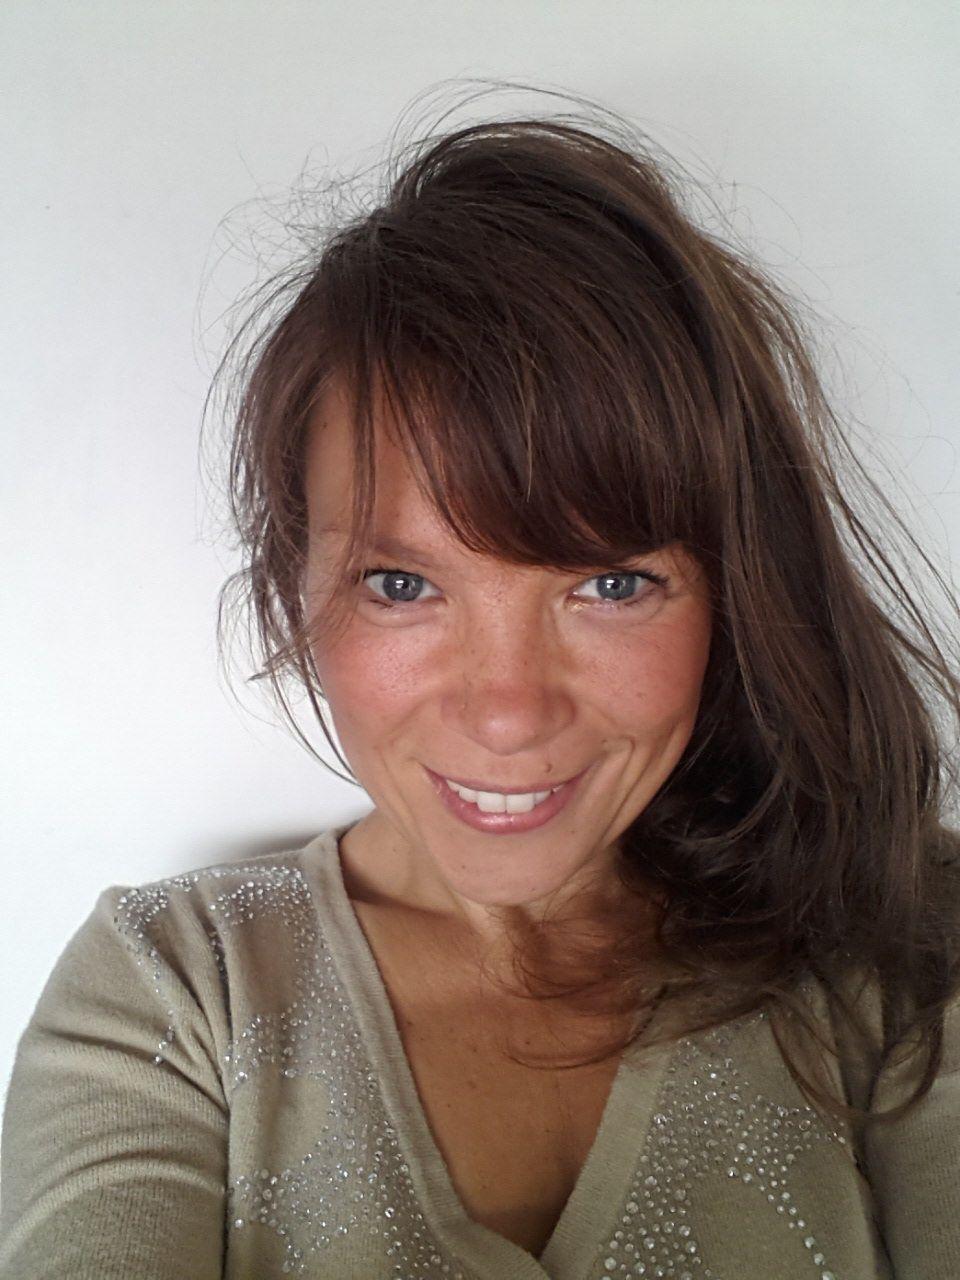 Miriam Skjerbæk Kobbervedt Mortensen